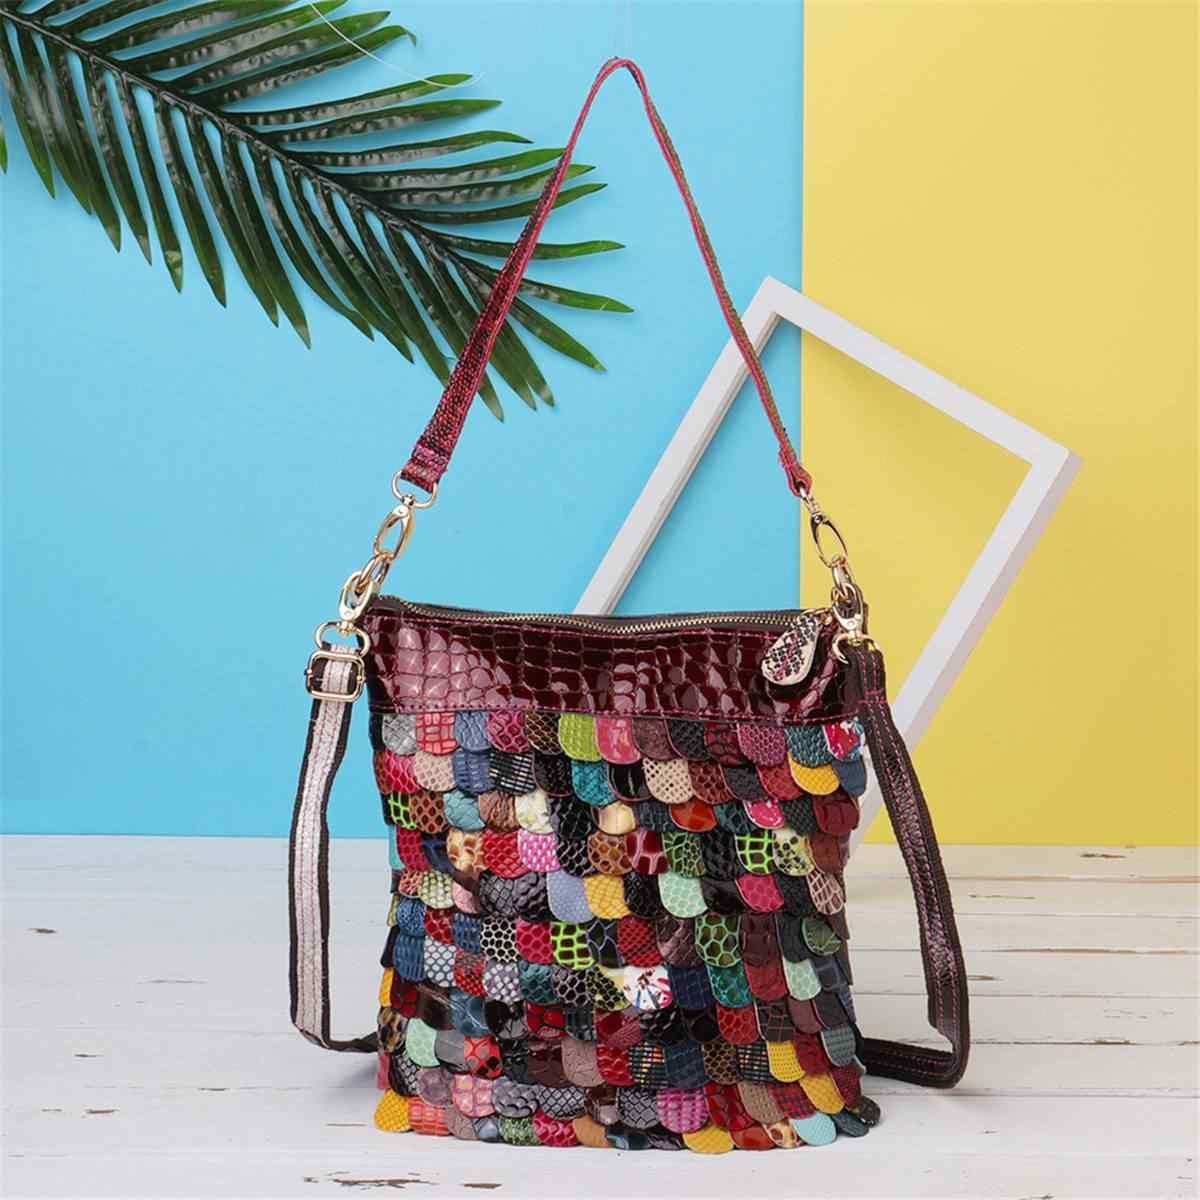 1464da78feb6 AEQUEEN Luxury Brand Genuine Leather Handbags For Women Floral Shoulder  Crossbody Bags Patchwork Purse Totes Bolsos